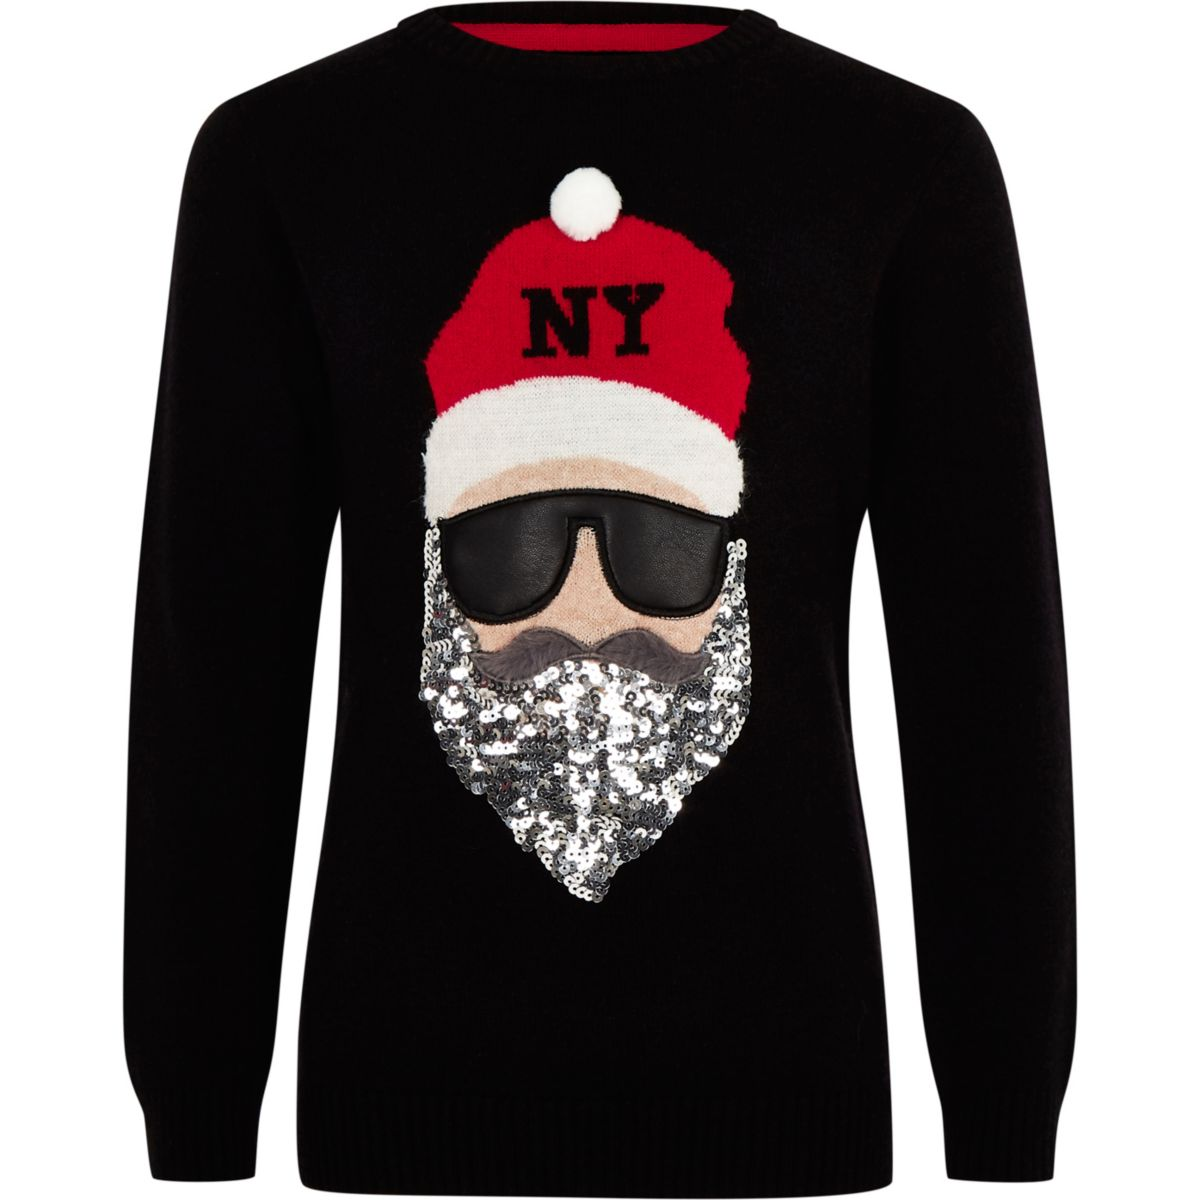 Kids black Santa Claus Christmas sweater